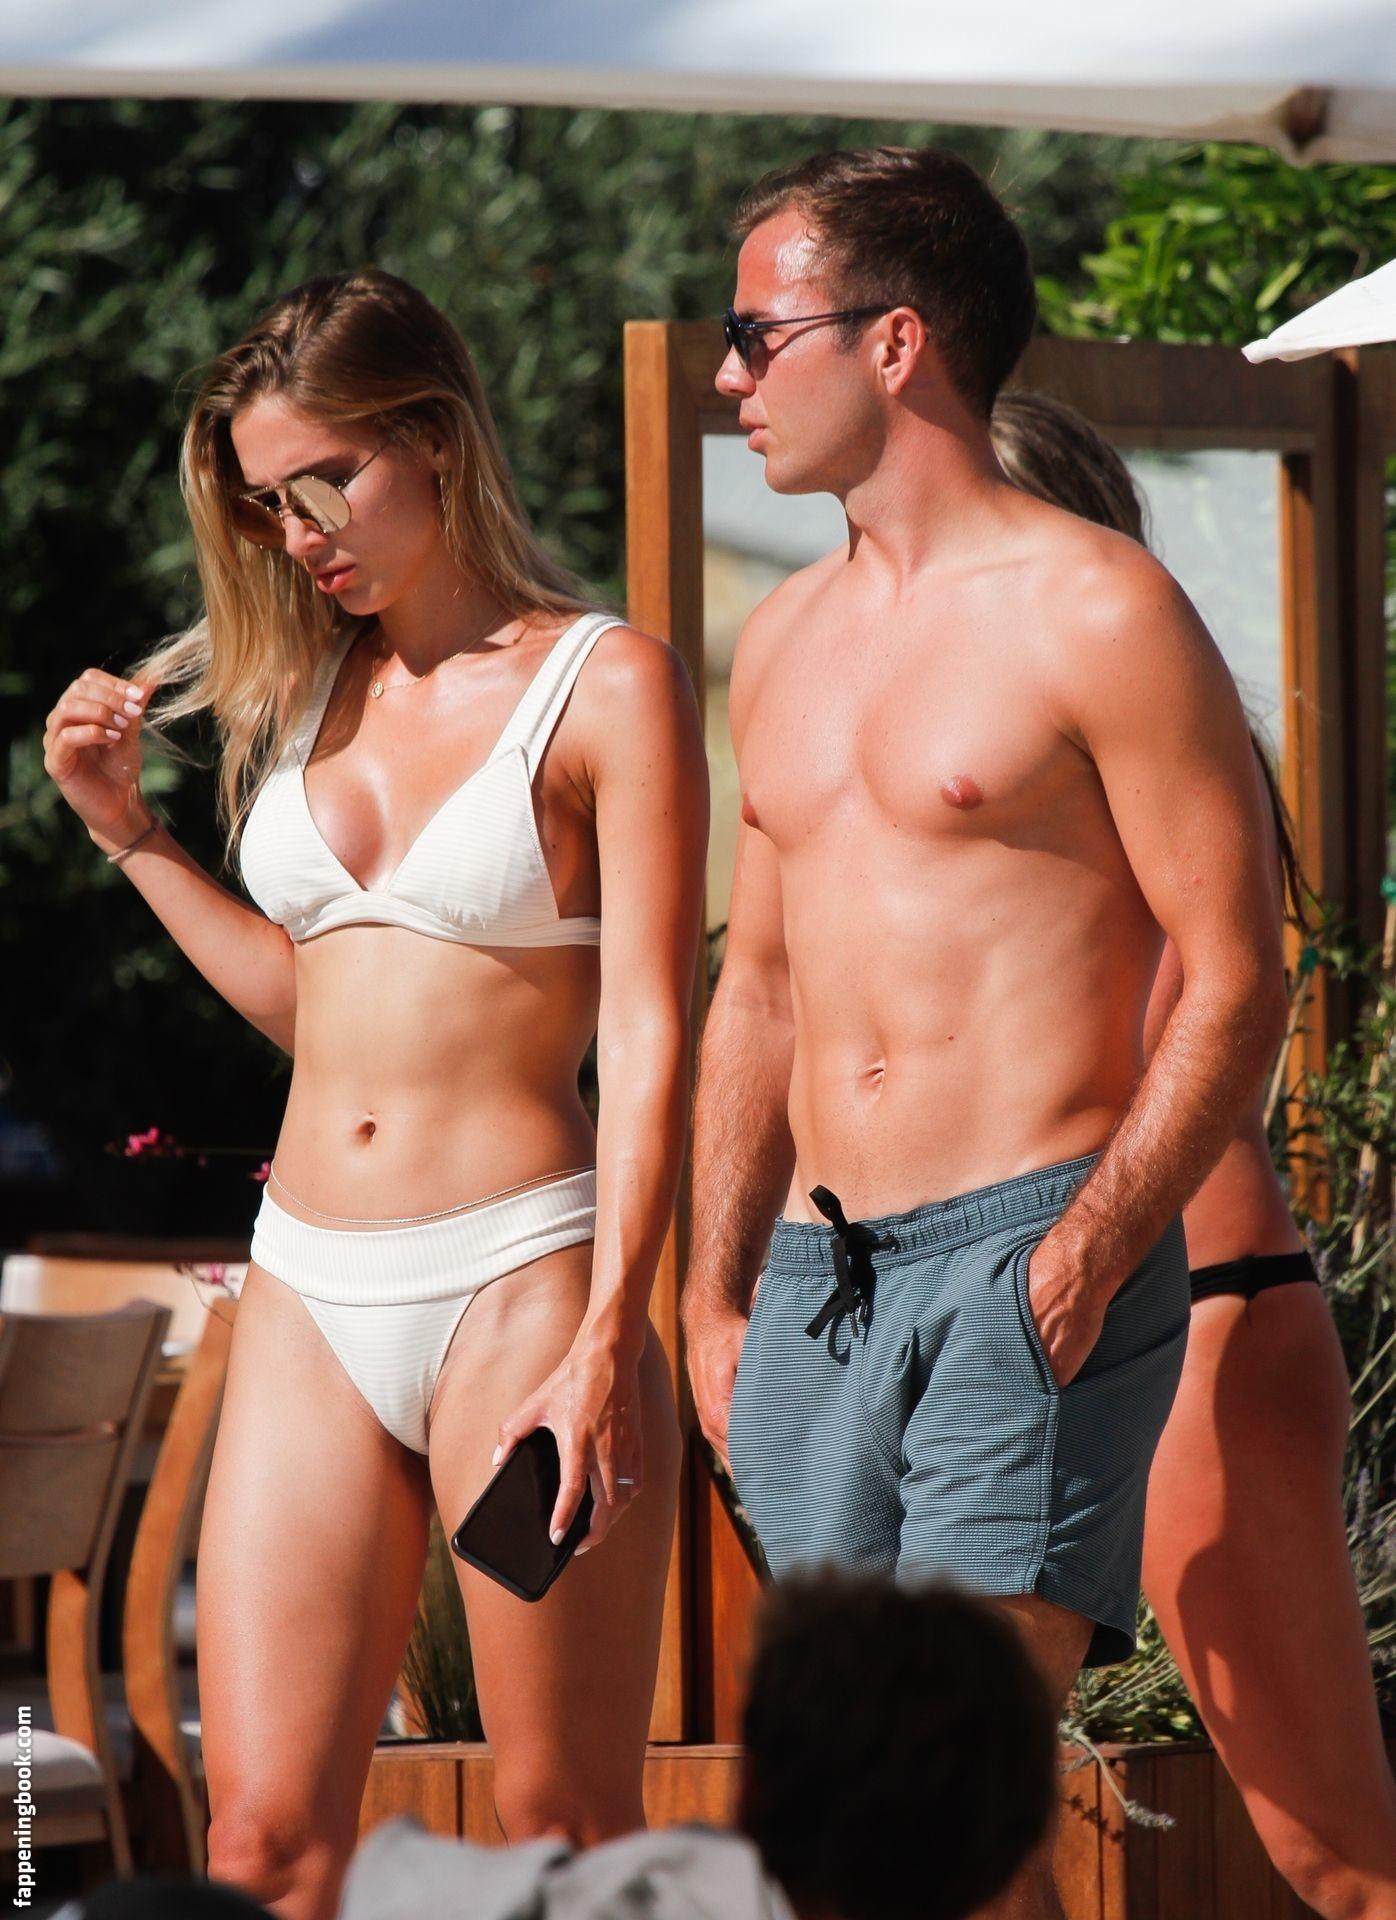 Kathrin brömmel playboy ann 41 Sexiest